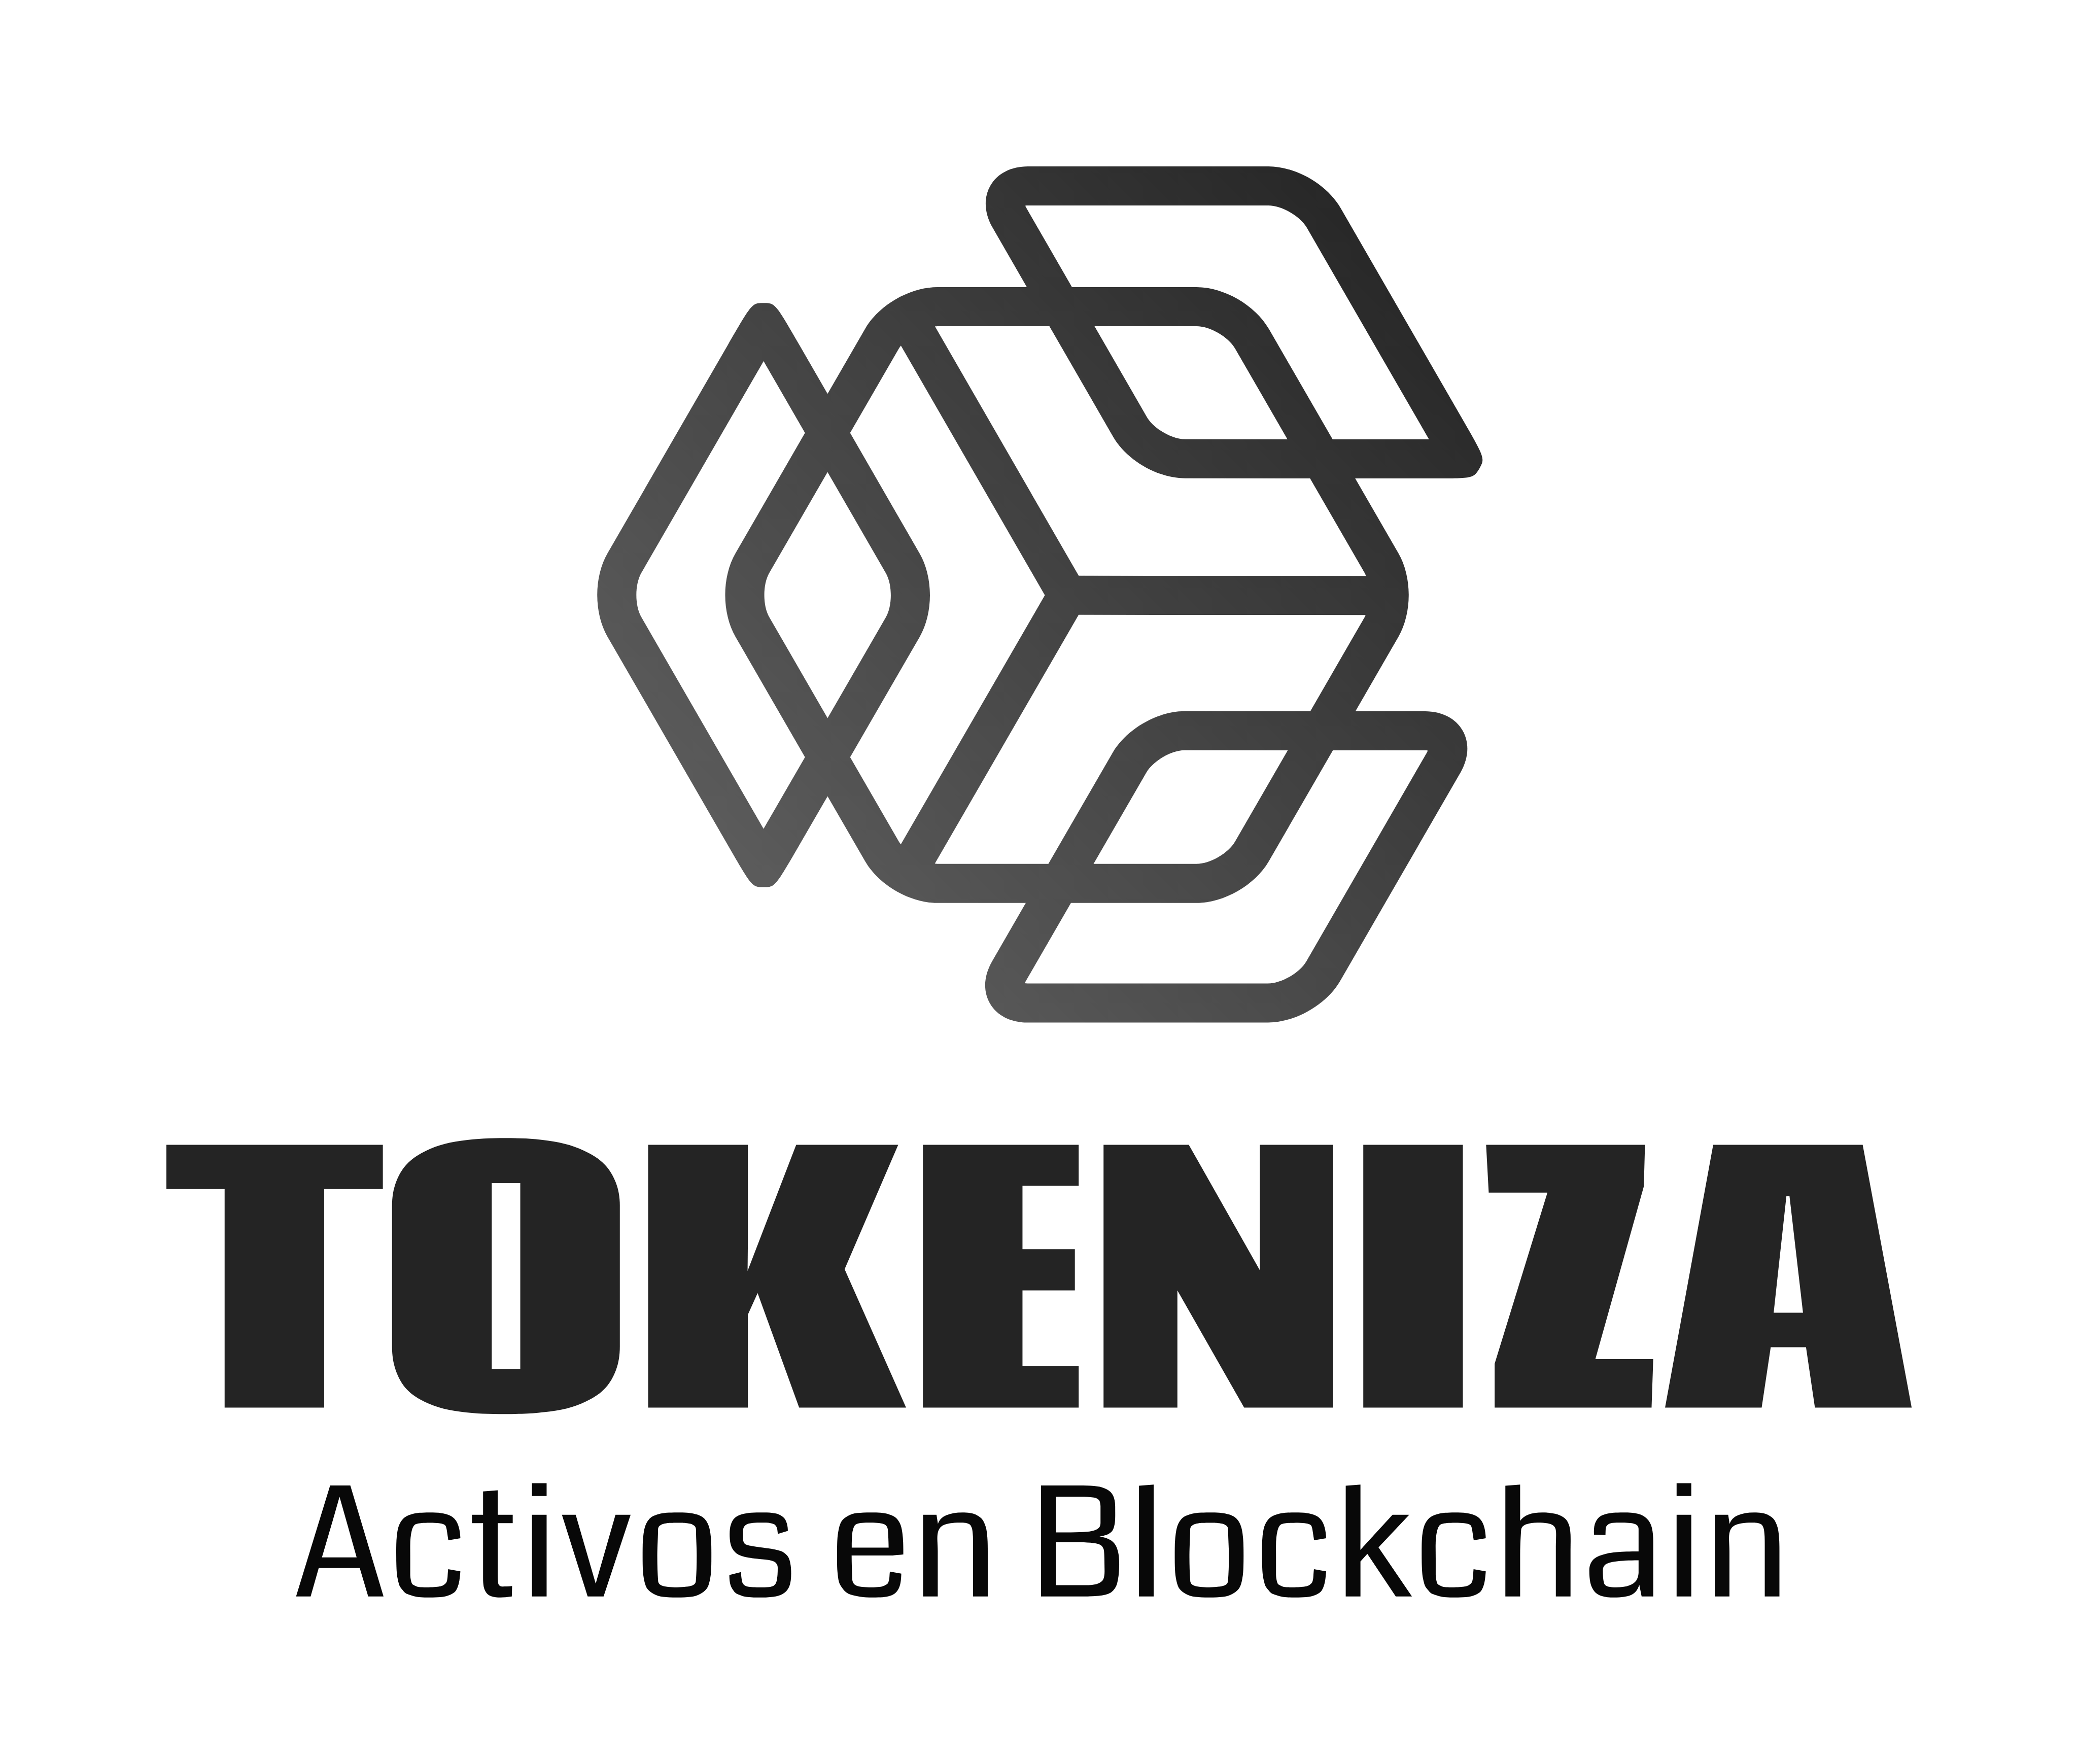 Tokeniza